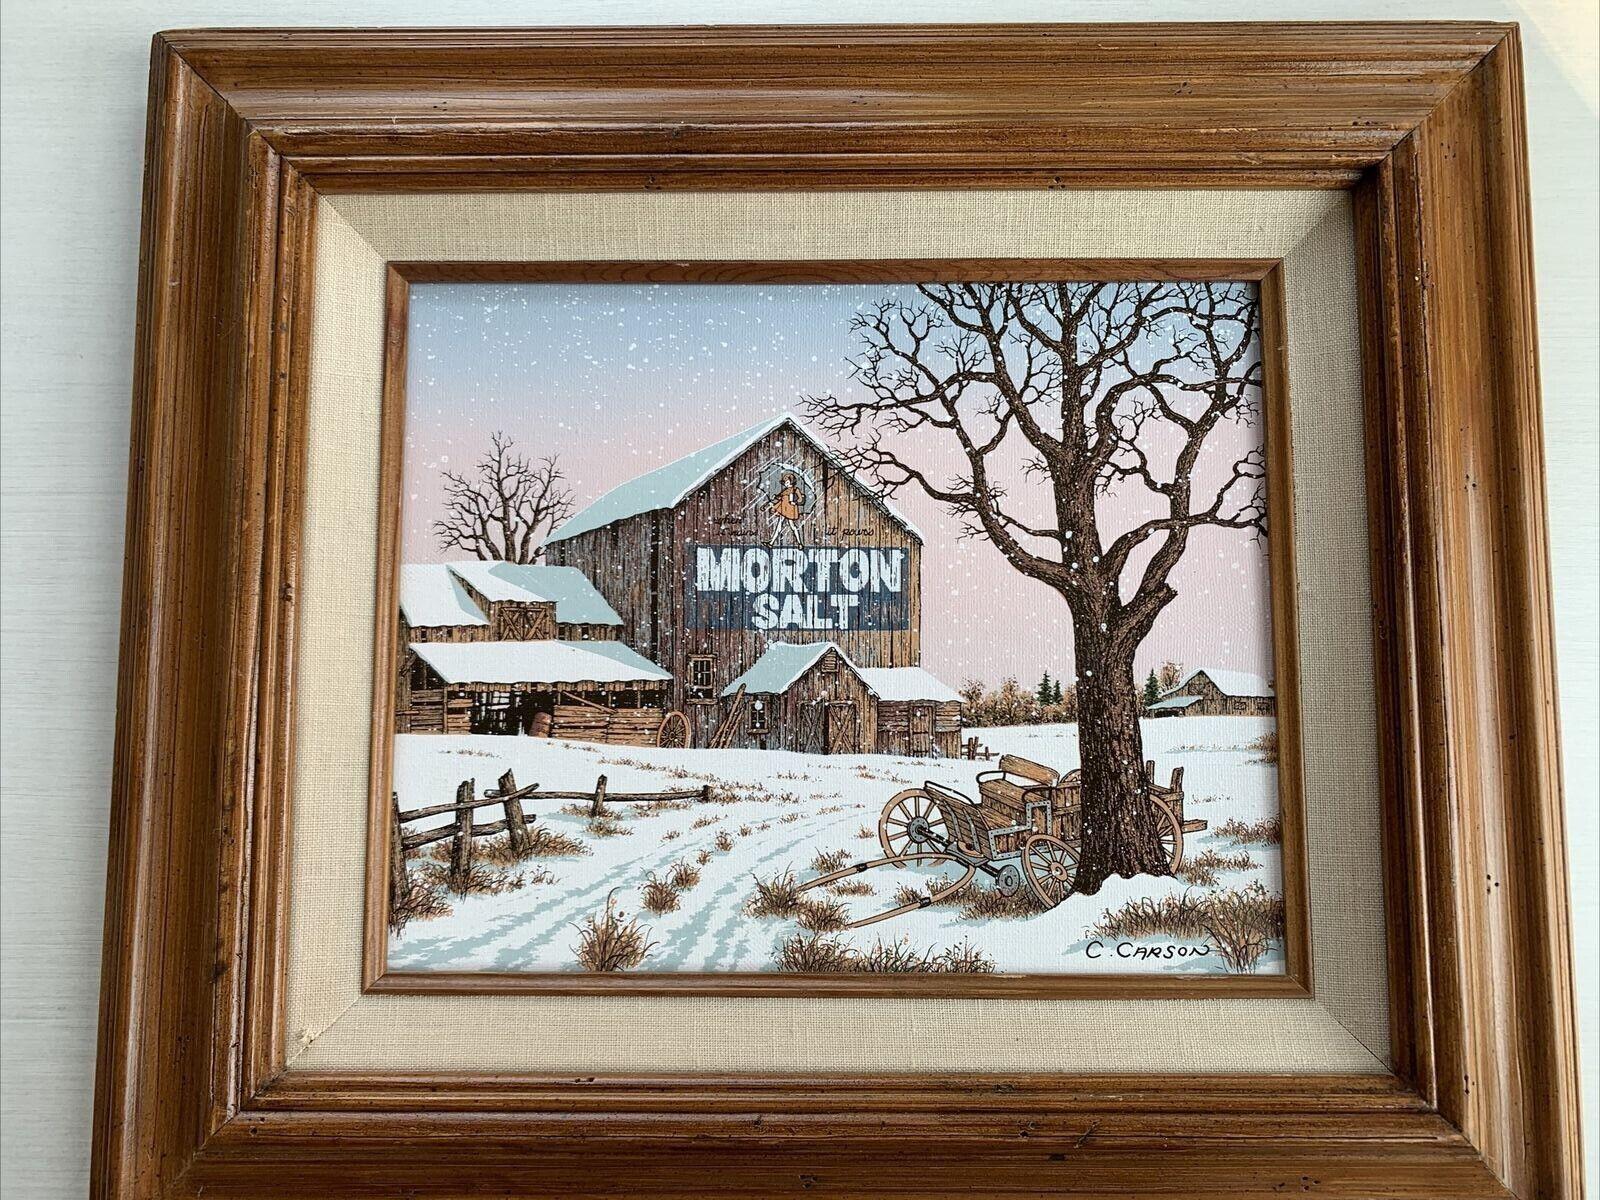 Art Effects Songbird Ii By Tava Studios Framed Painting Print C35188 For Sale Online Ebay